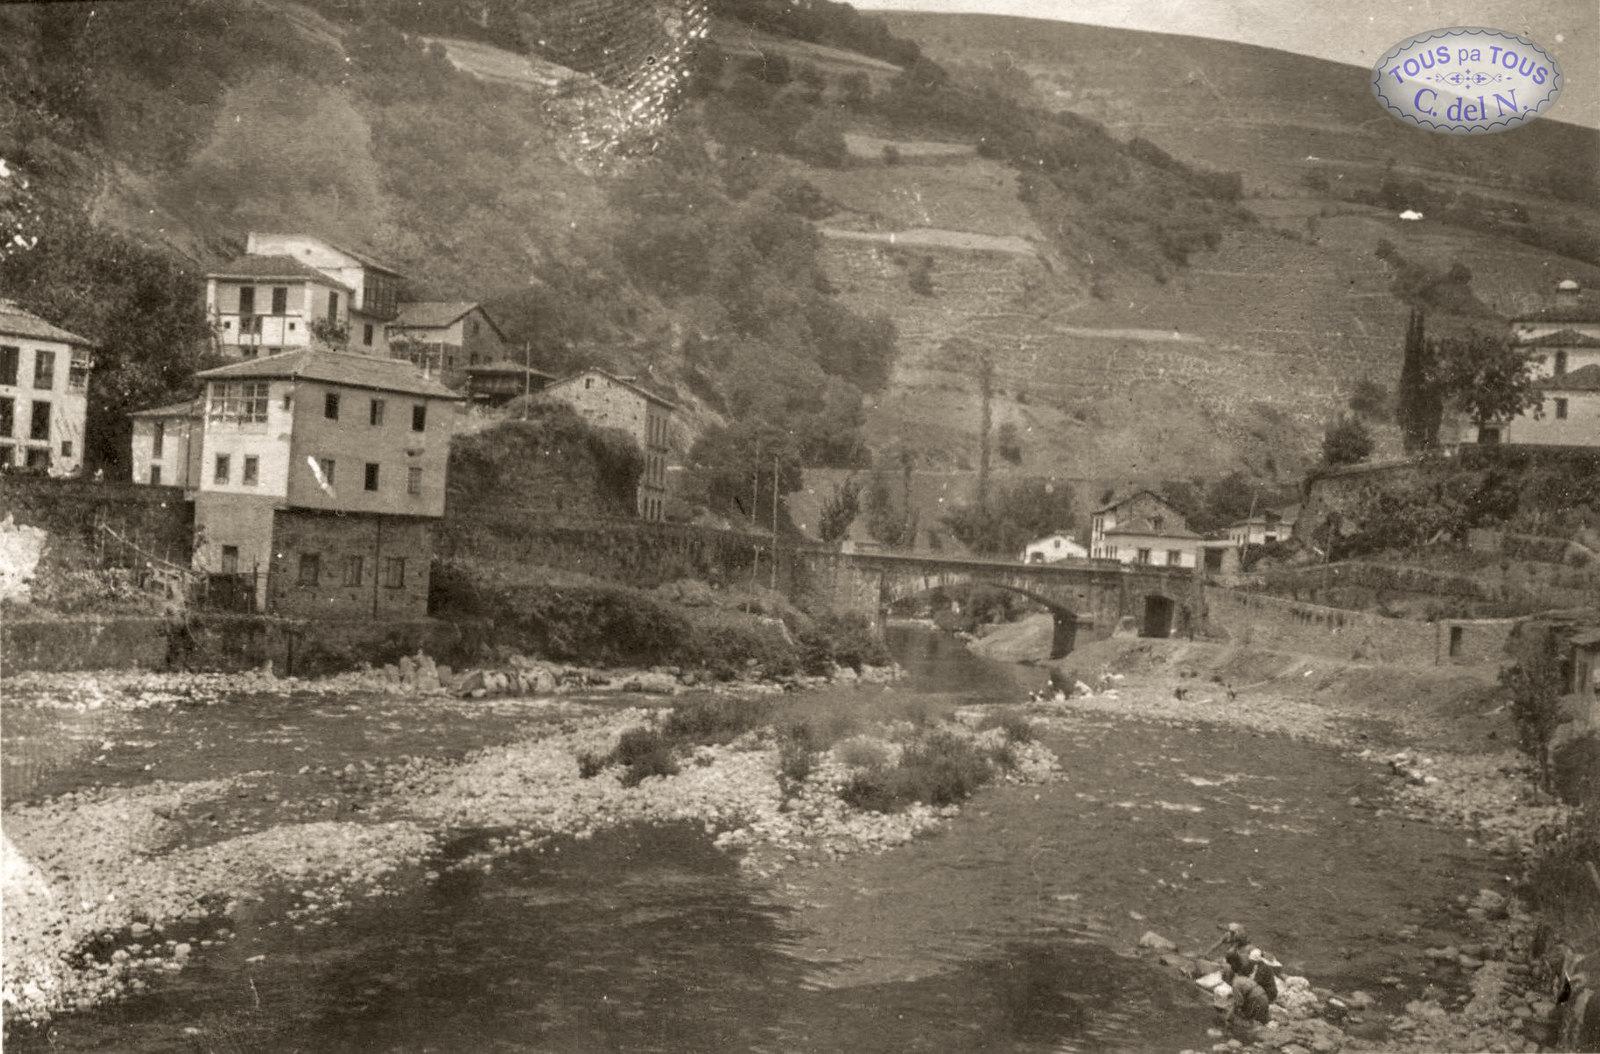 1930 - Río Narcea